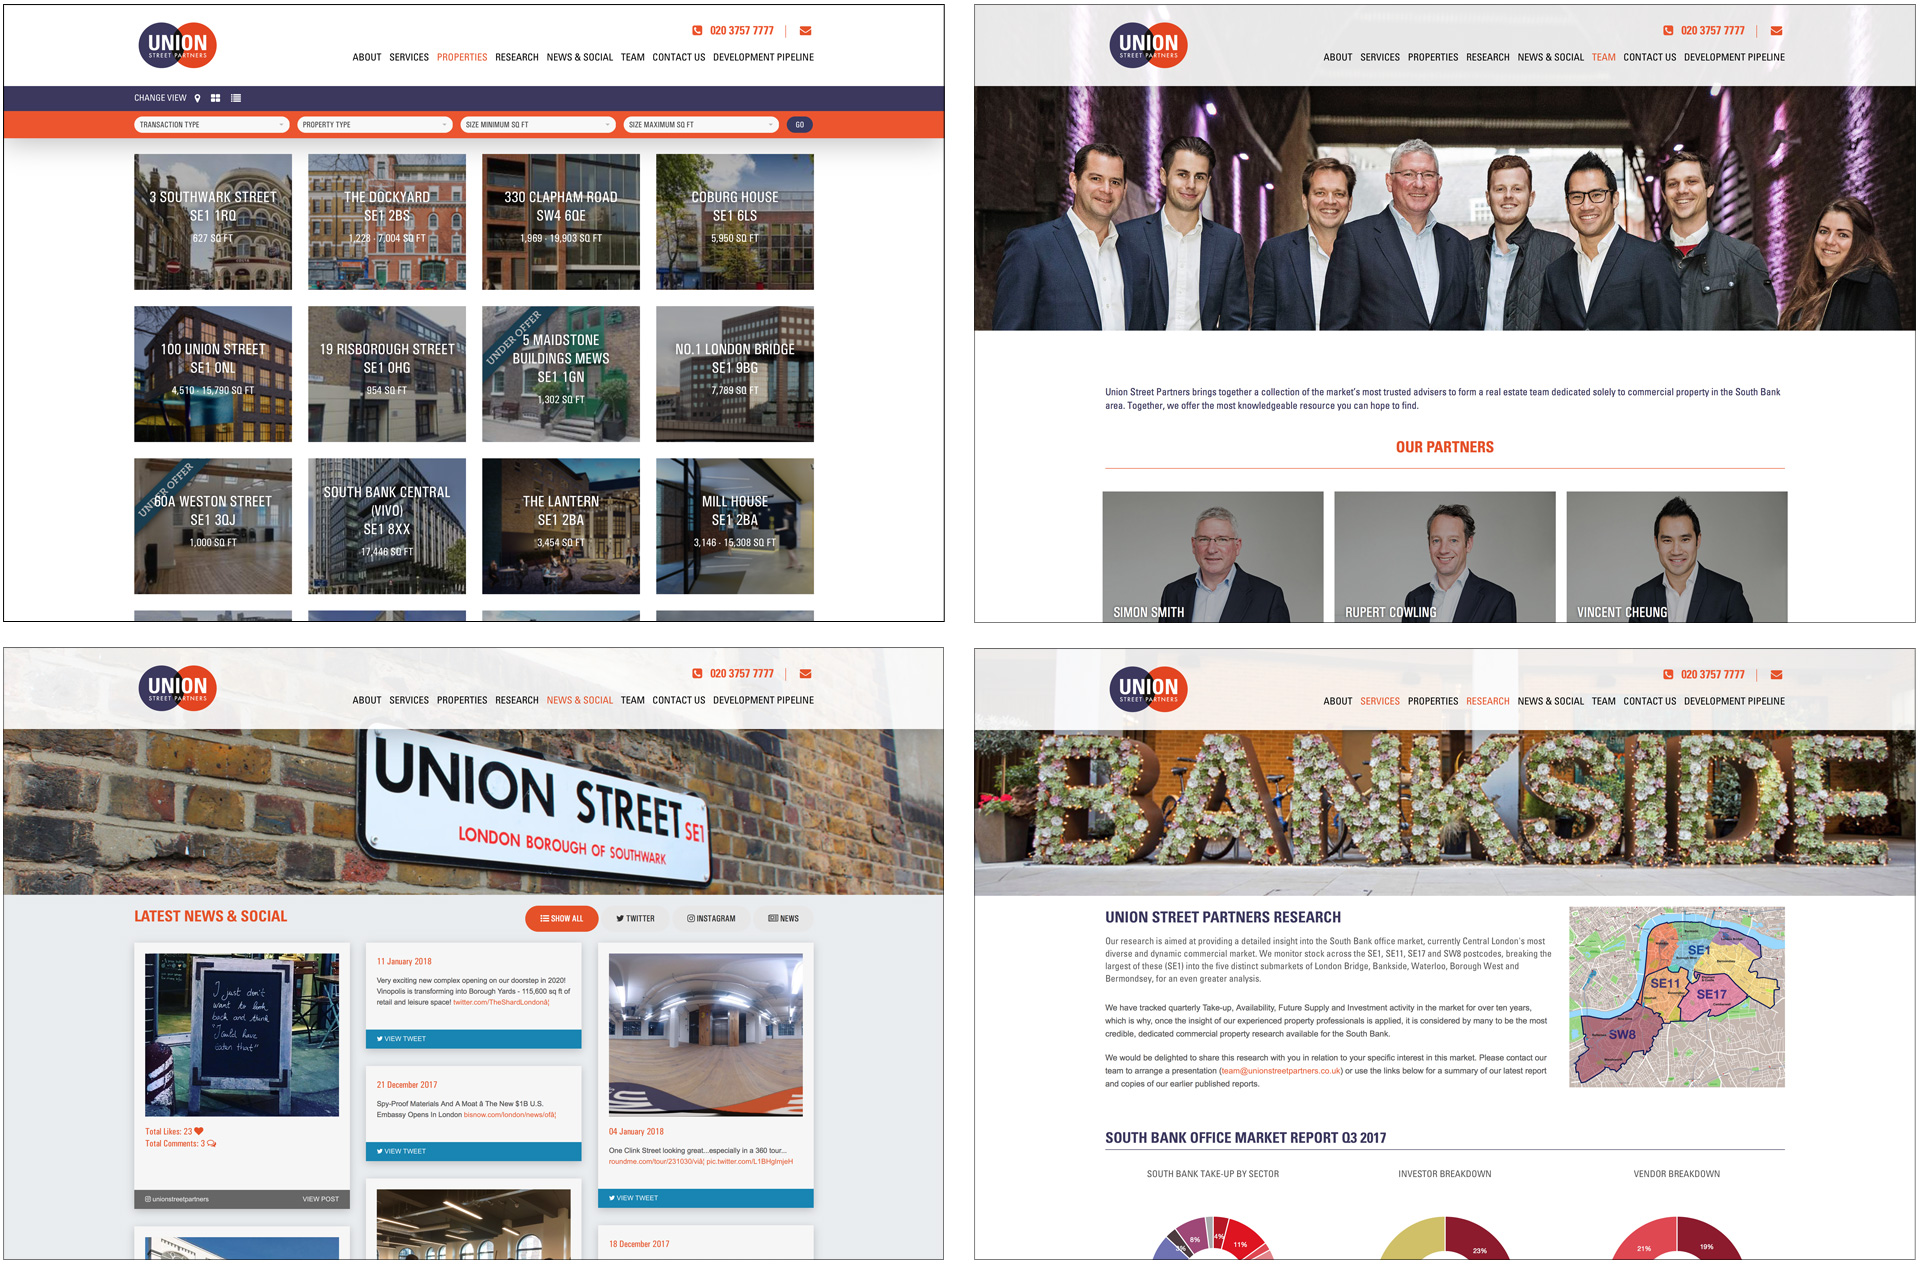 Union Street Partners